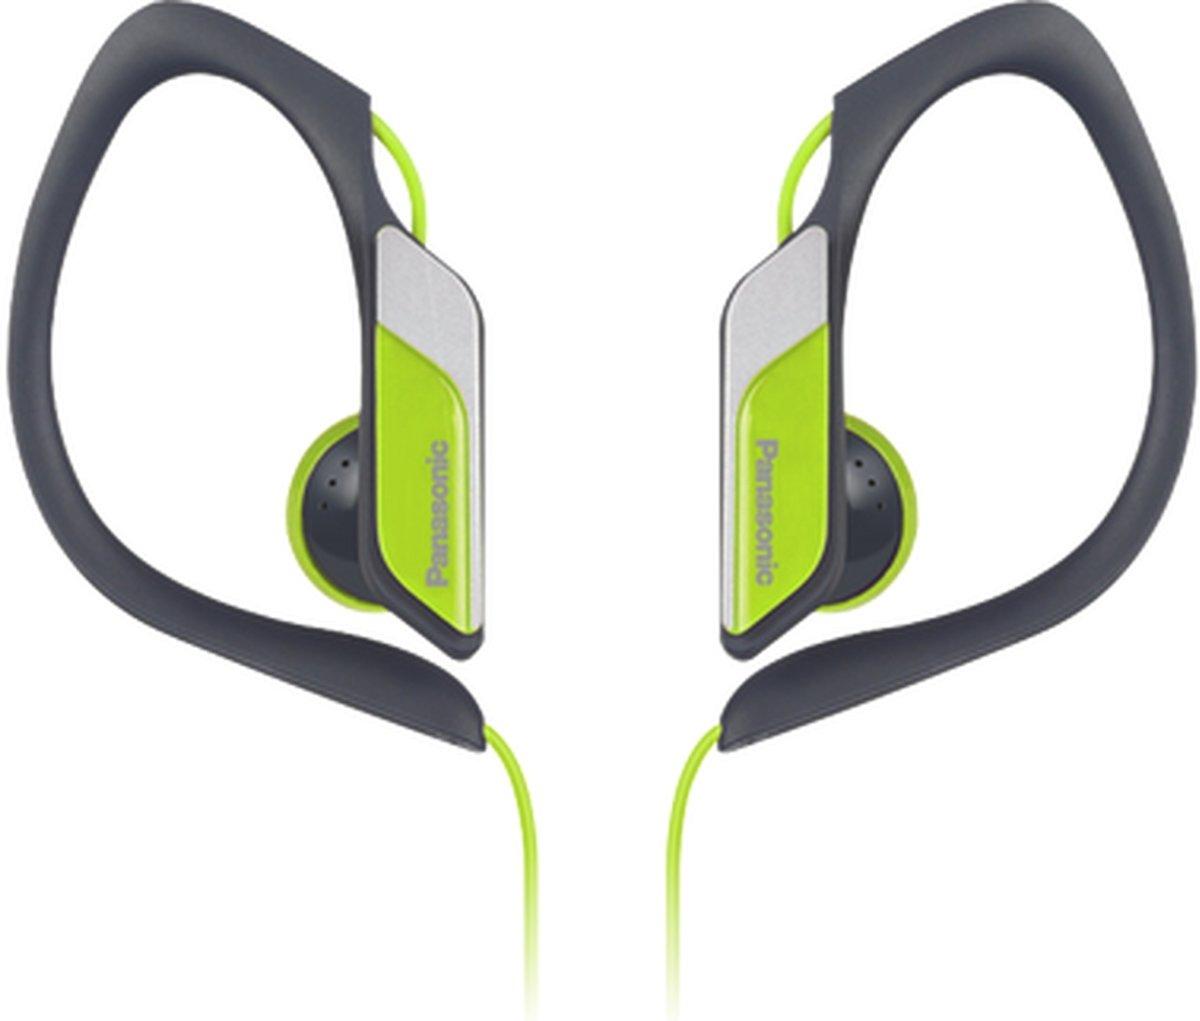 Panasonic RP-HS34E Zwart, Geel Intraauraal oorhaak, In-ear koptelefoon kopen